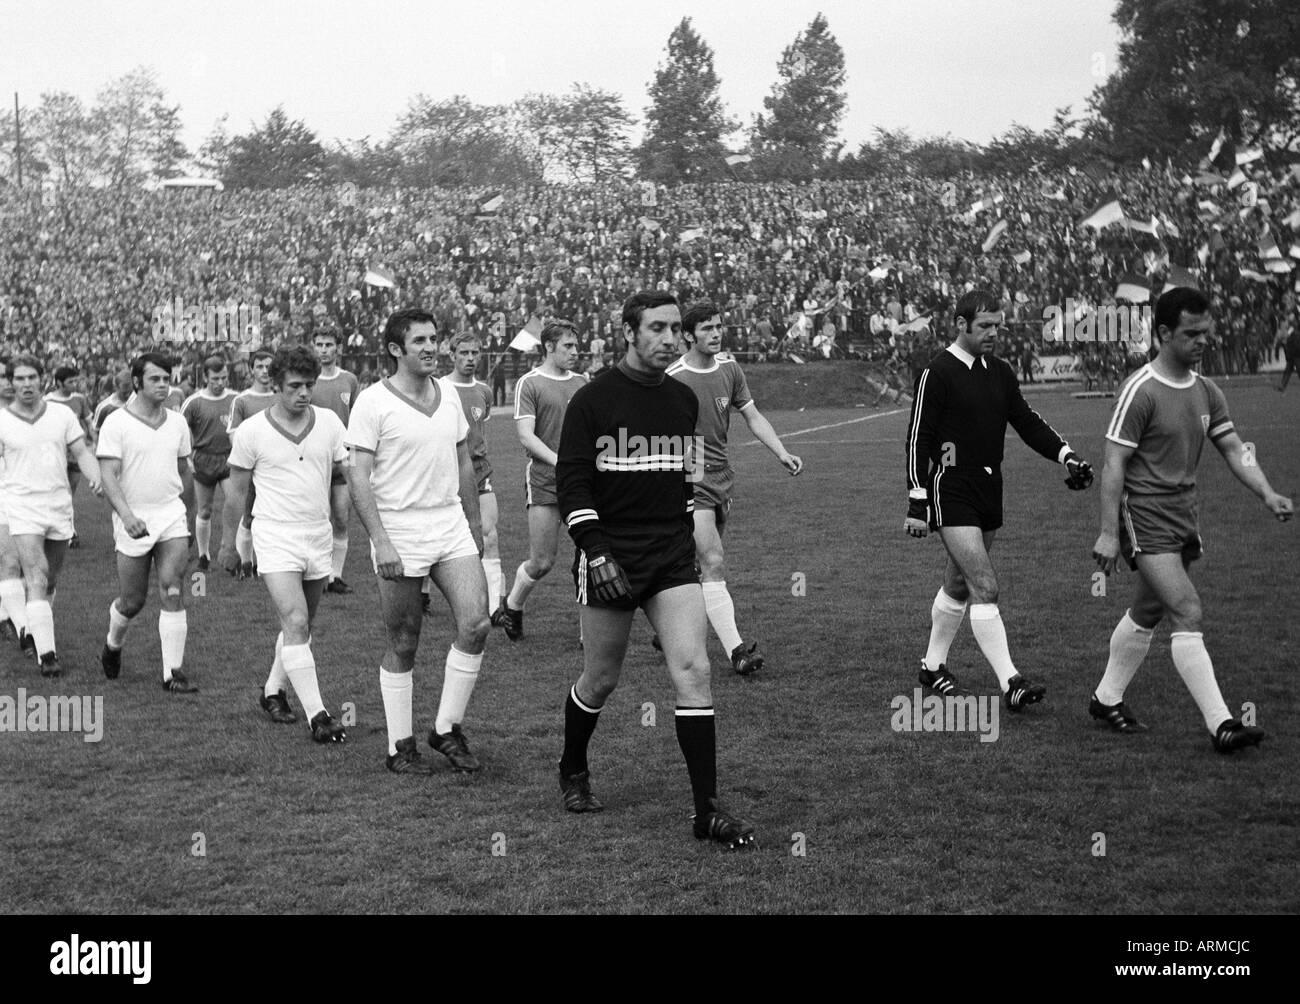 football, Regionalliga 1969/1970, promotion match to the Bundesliga 1970/1971, VfL Bochum versus FK Pirmasens 3:1, Stadium an der Castroper Strasse in Bochum, teams come in the stadium, ahead in white jerseys Pirmasens football players f.l.t.r. Dieter Wei - Stock Image